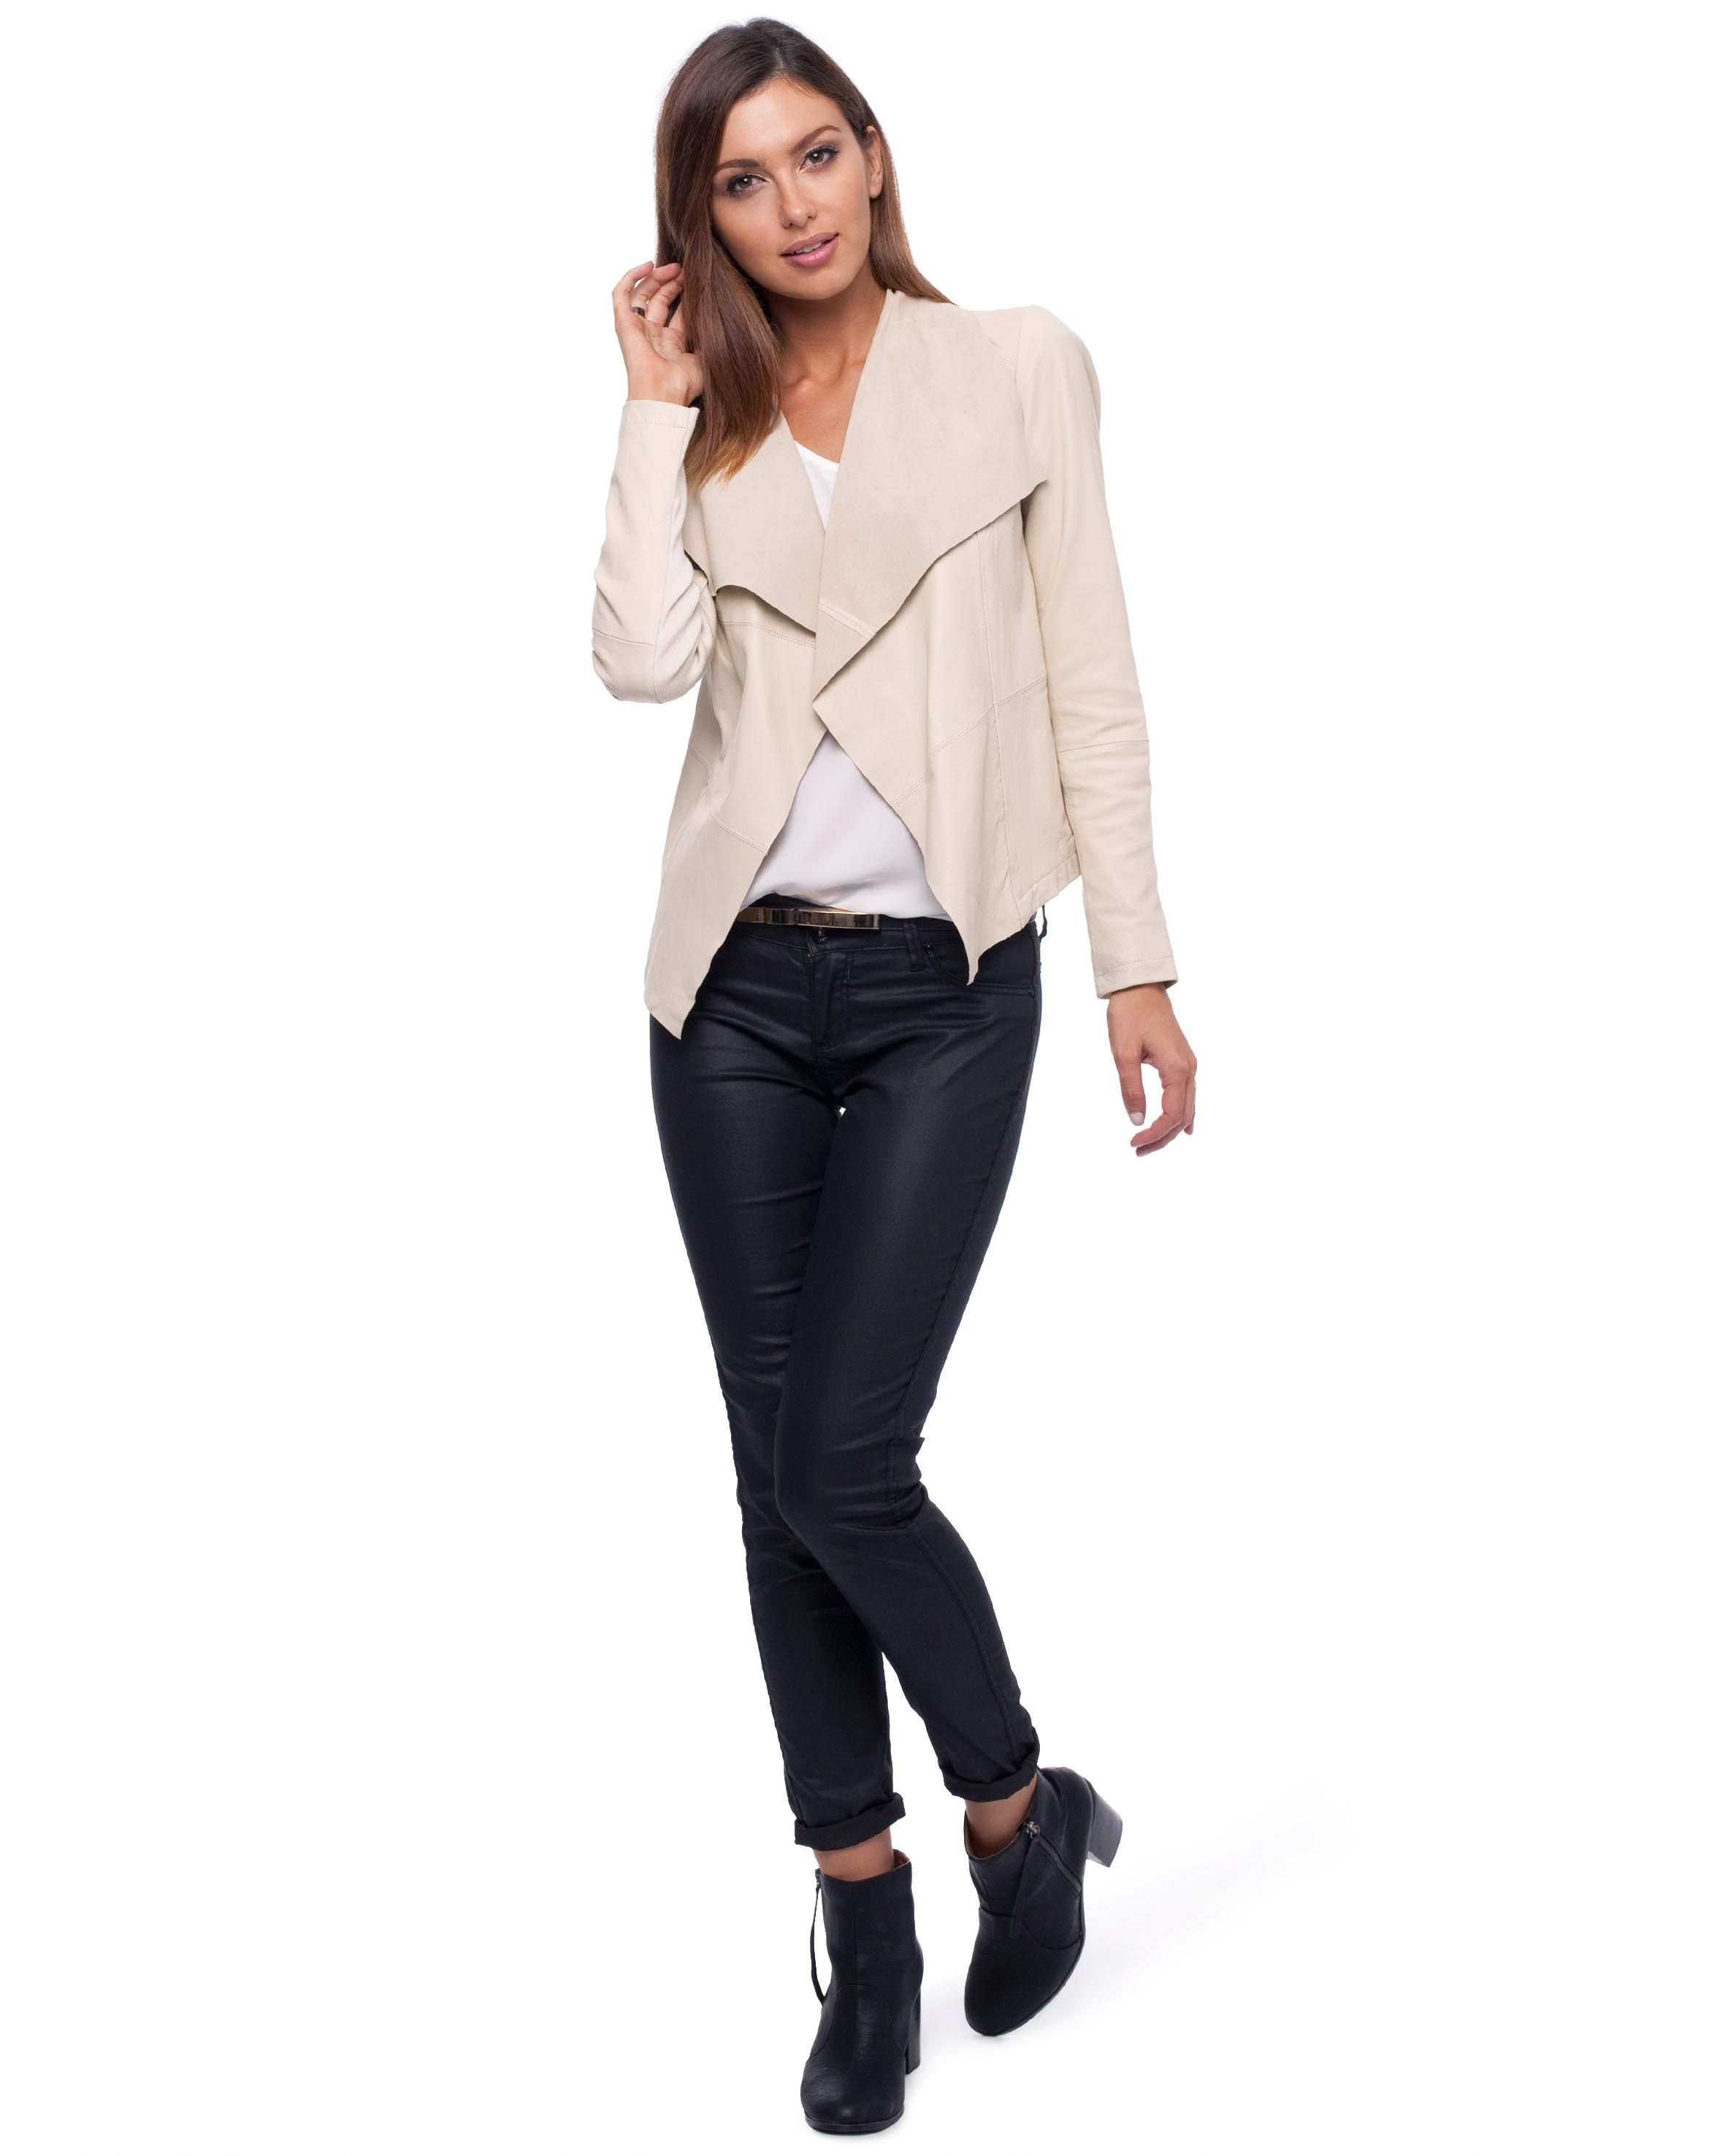 Leather jacket online australia - Ransom Leather Jacket By Decjuba Online The Iconic Australia